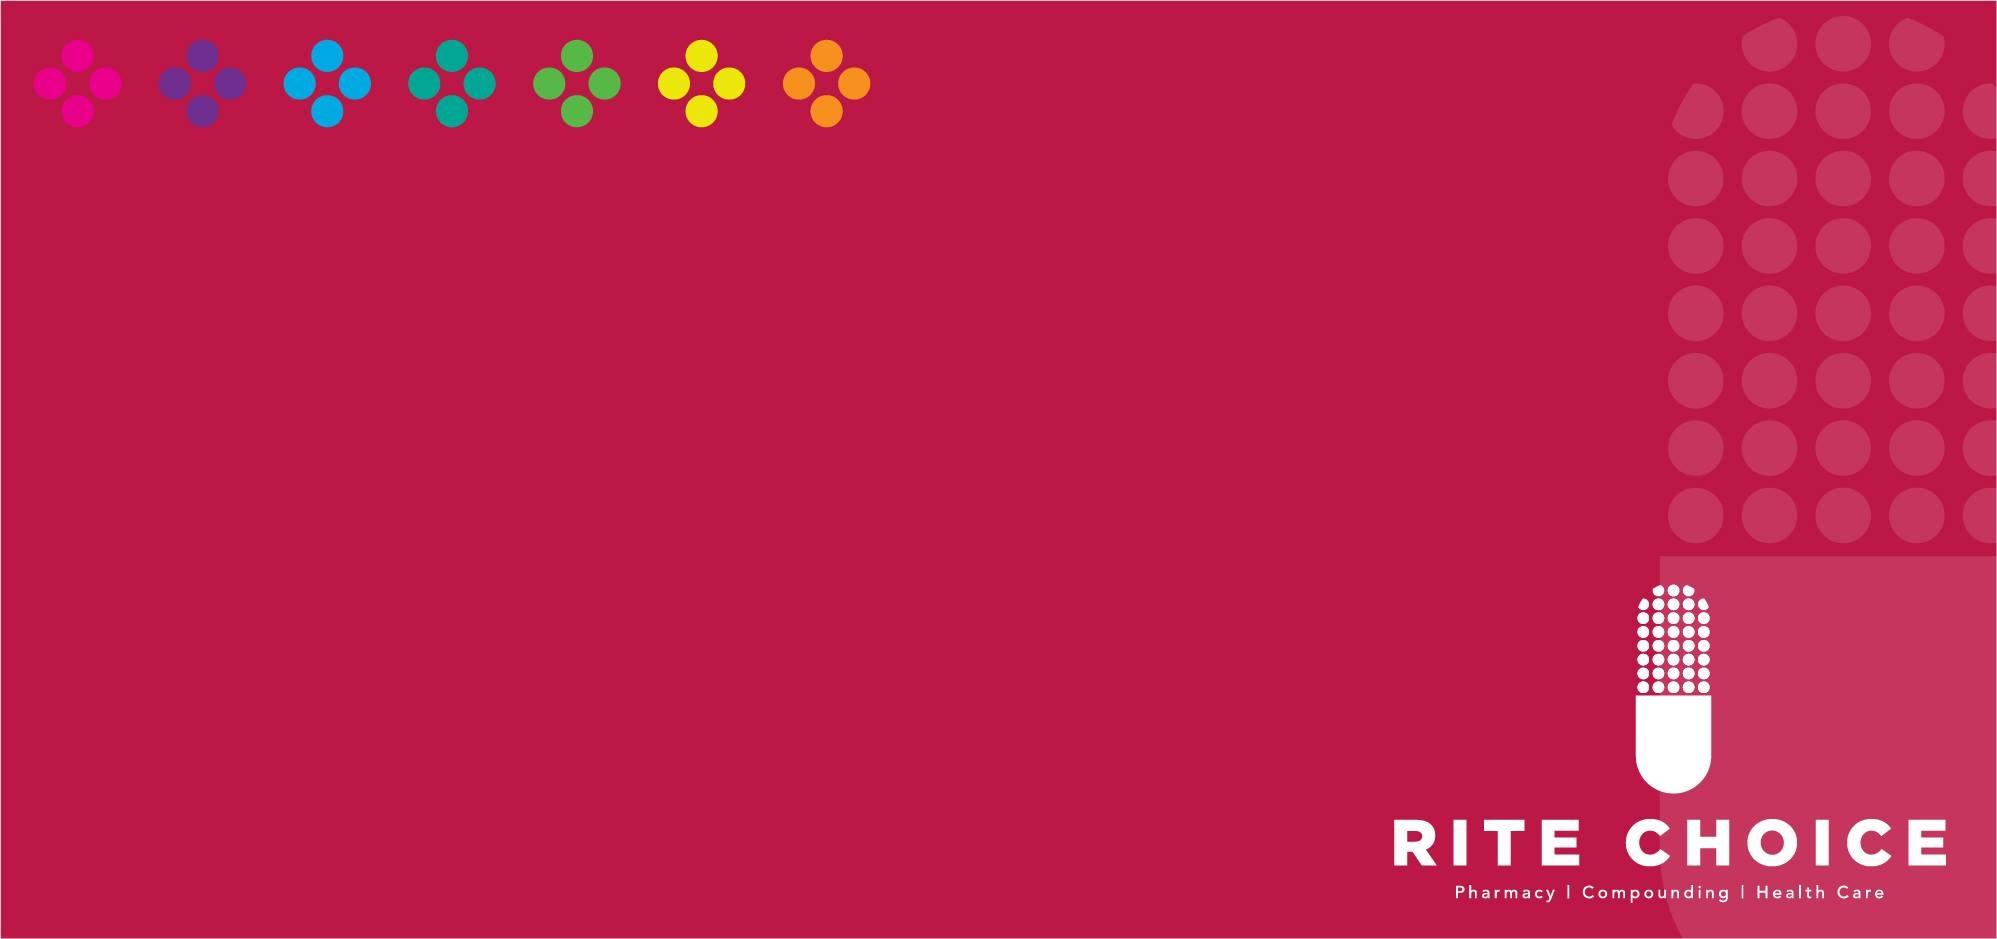 Rite Choice Pharmacy LTD (@ritechoicepharmacy) Cover Image